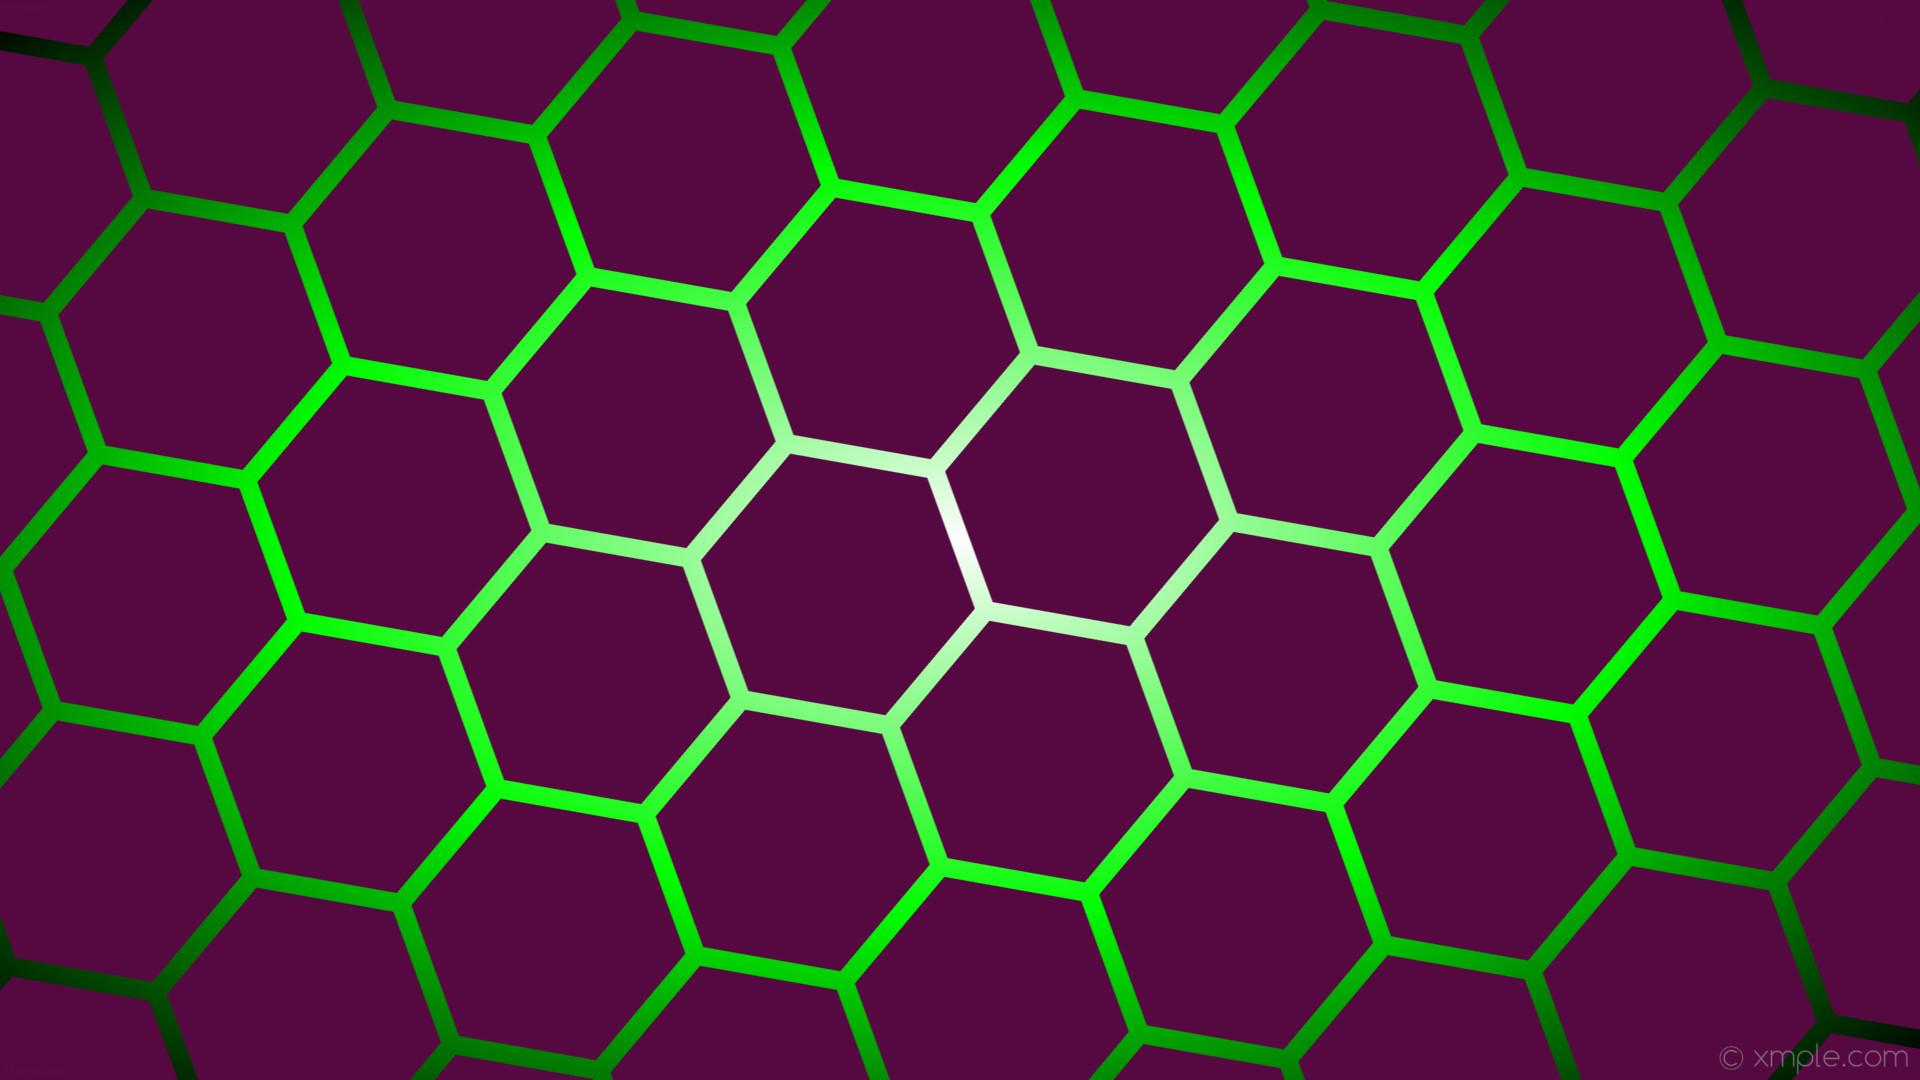 wallpaper gradient green white black hexagon pink glow dark pink lime  #560940 #ffffff #